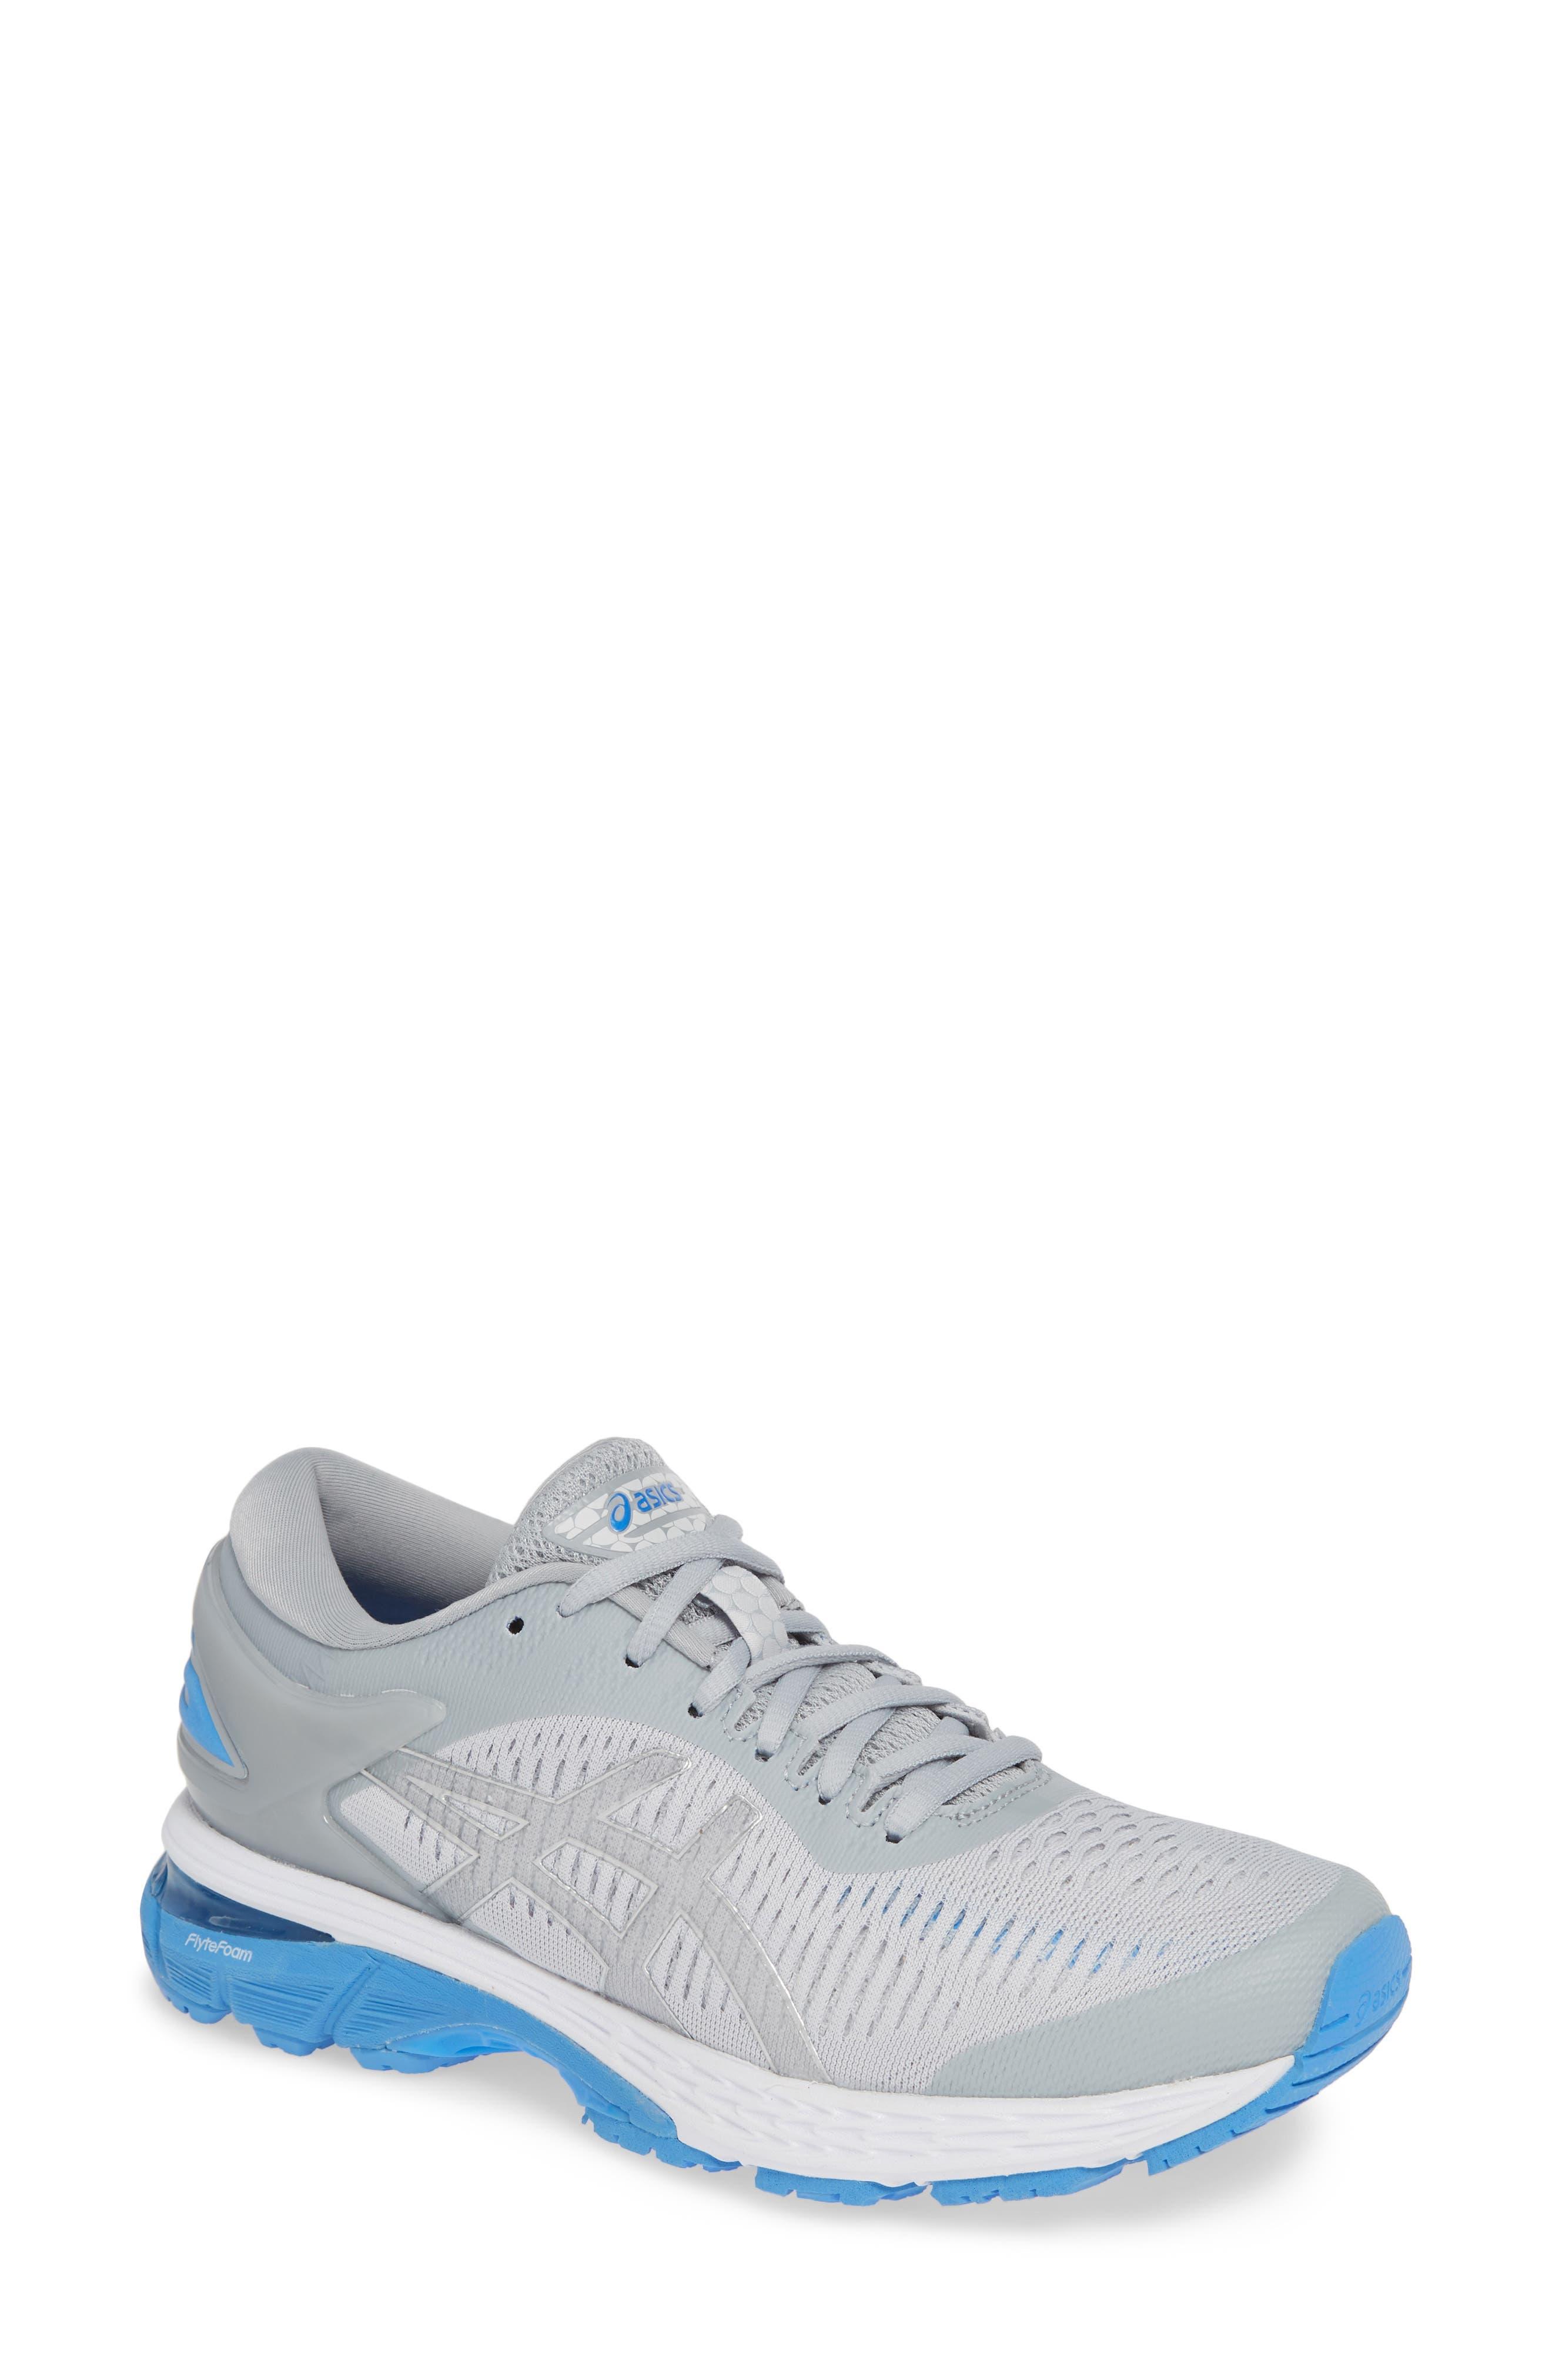 GEL-Kayano<sup>®</sup> 25 Running Shoe,                         Main,                         color, MID GREY/ BLUE